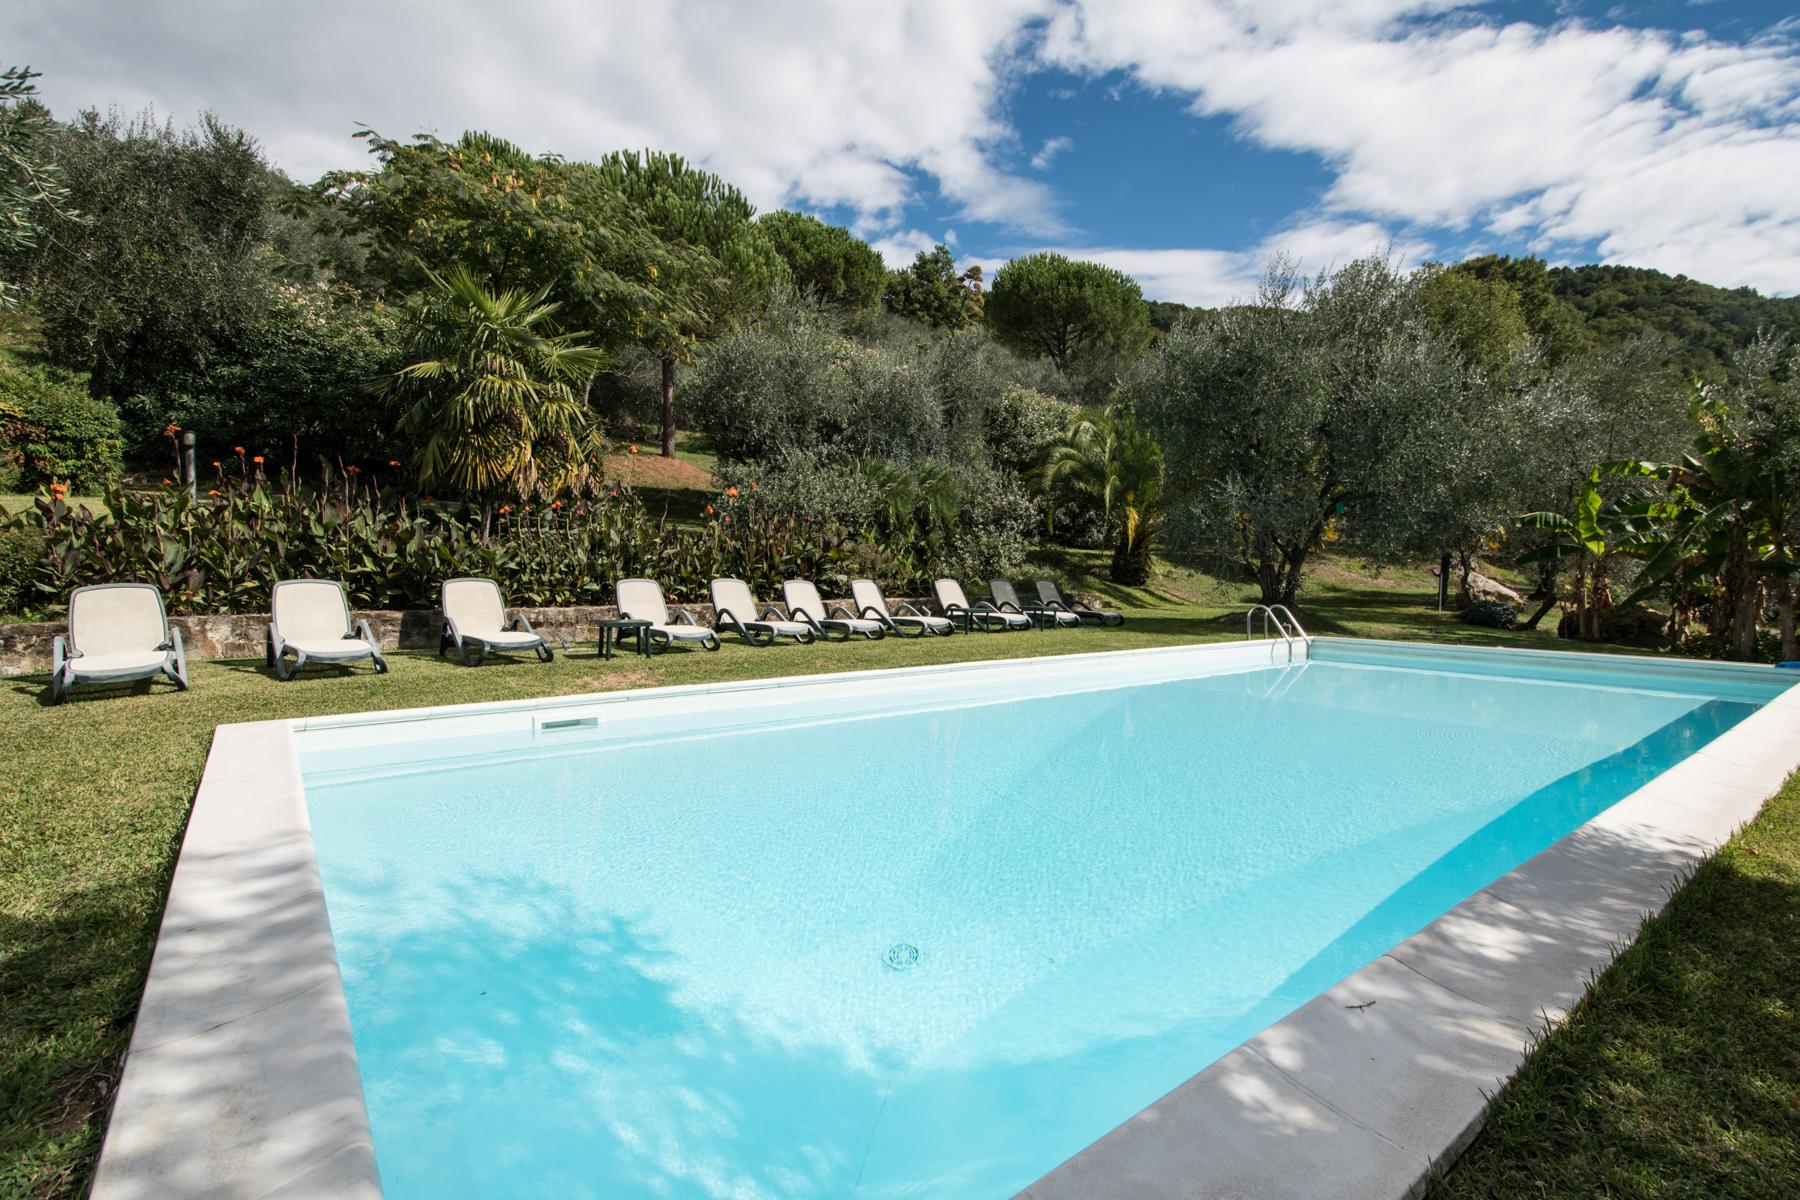 Villa in Vendita a Lucca: 5 locali, 1065 mq - Foto 25